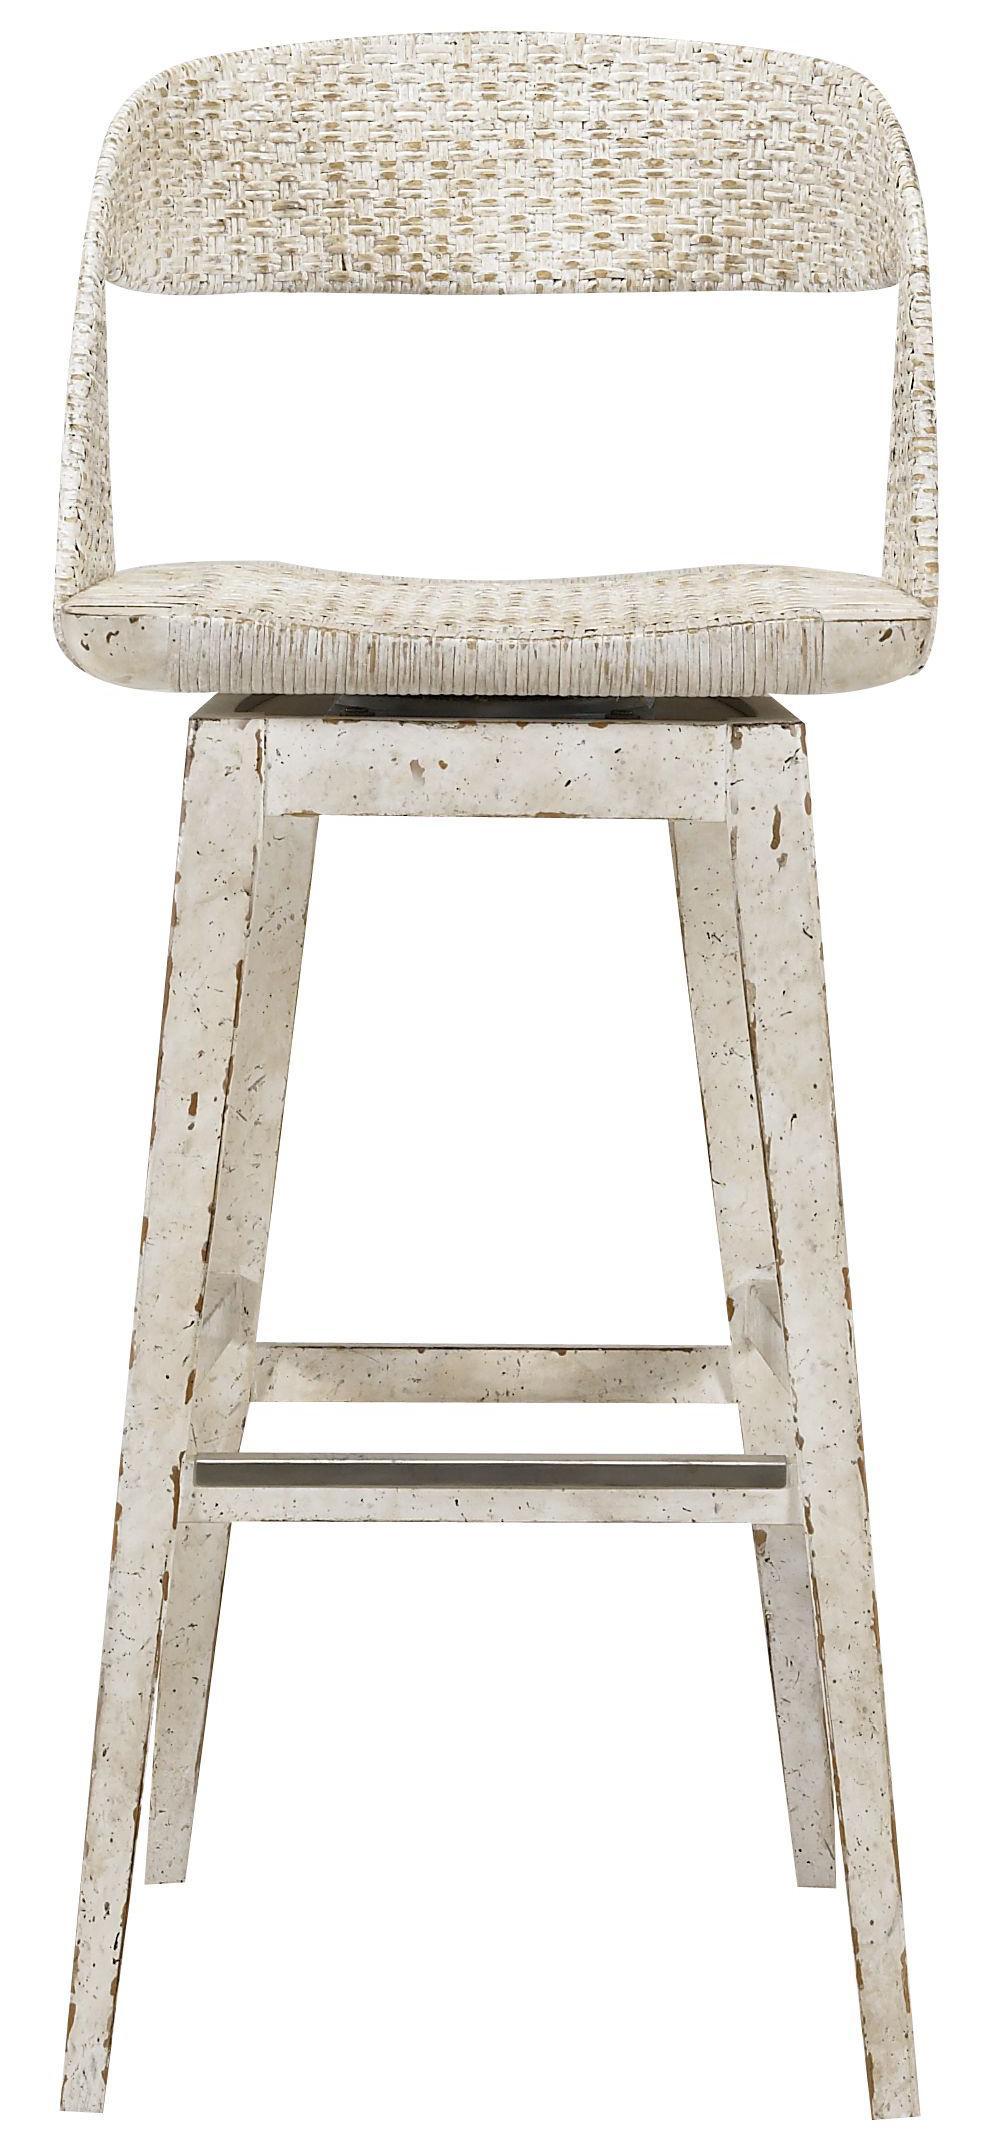 Stanley Furniture Archipelago Tambu Bar Stool - Item Number: 186-21-73